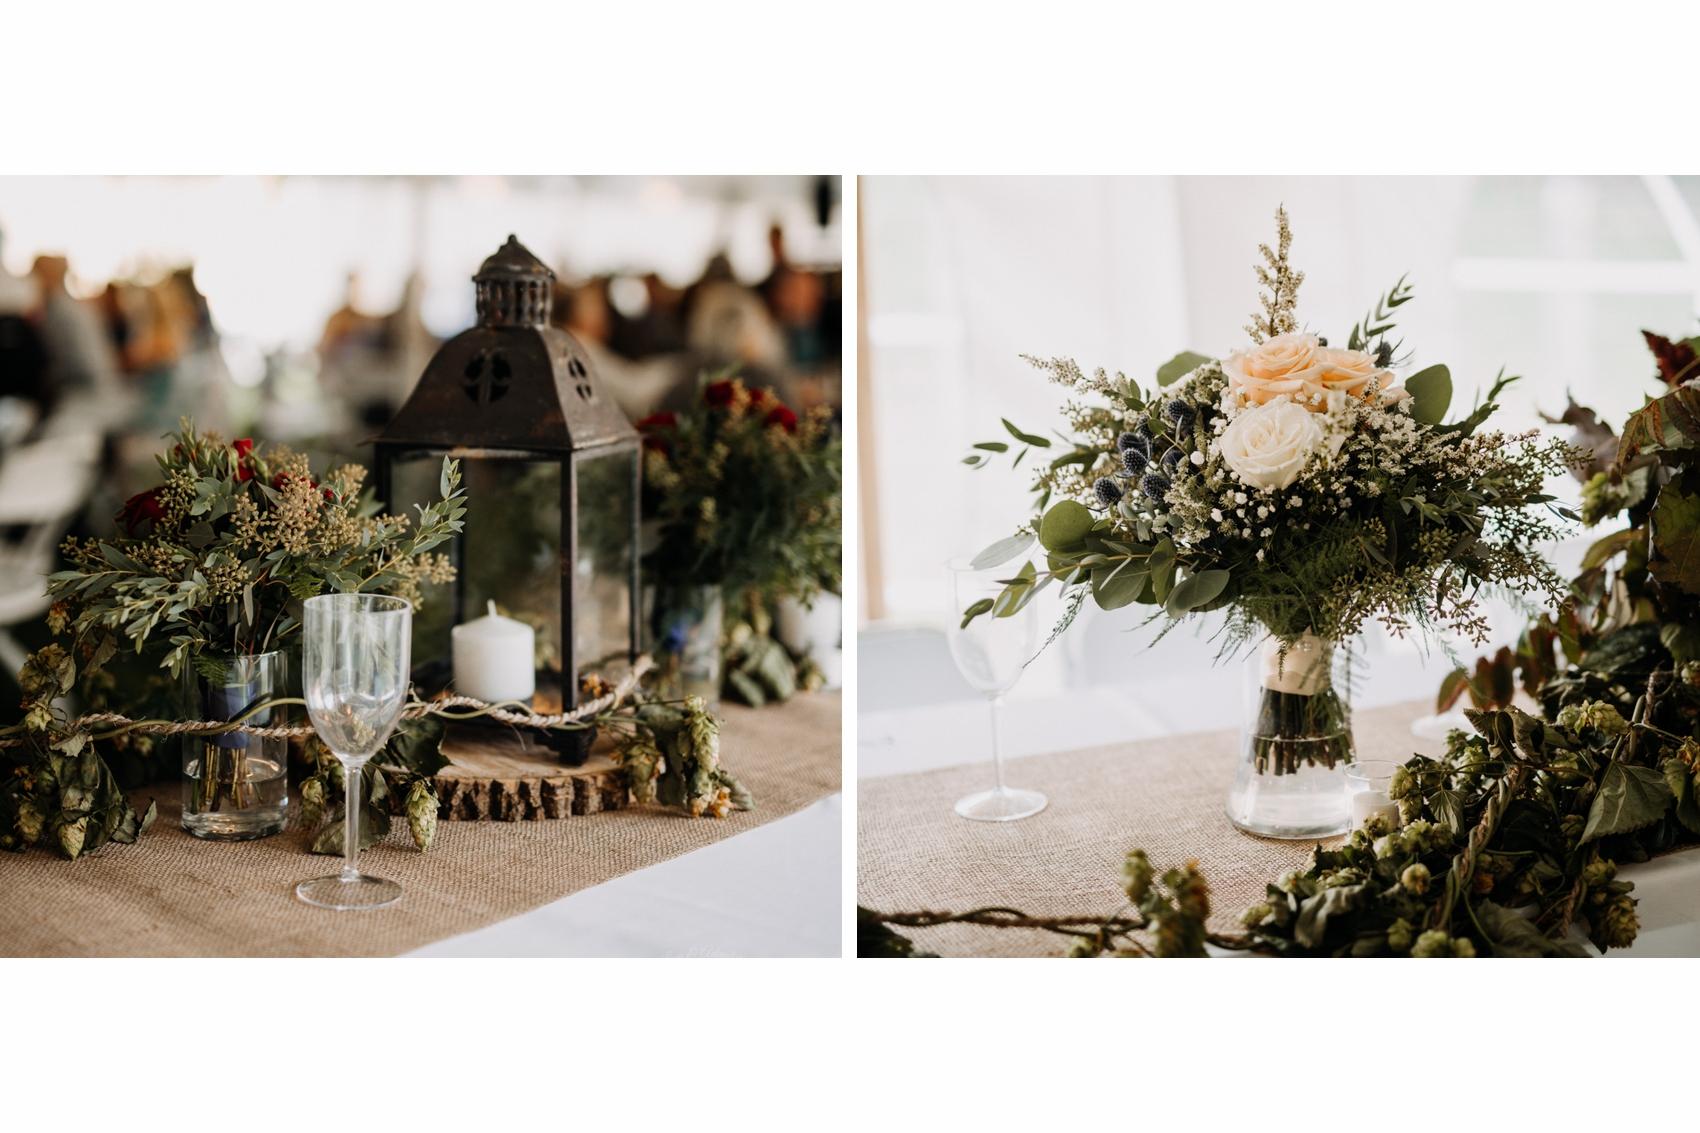 greenery-vine-wood-slab-table-decor-tent-wedding-reception.jpg